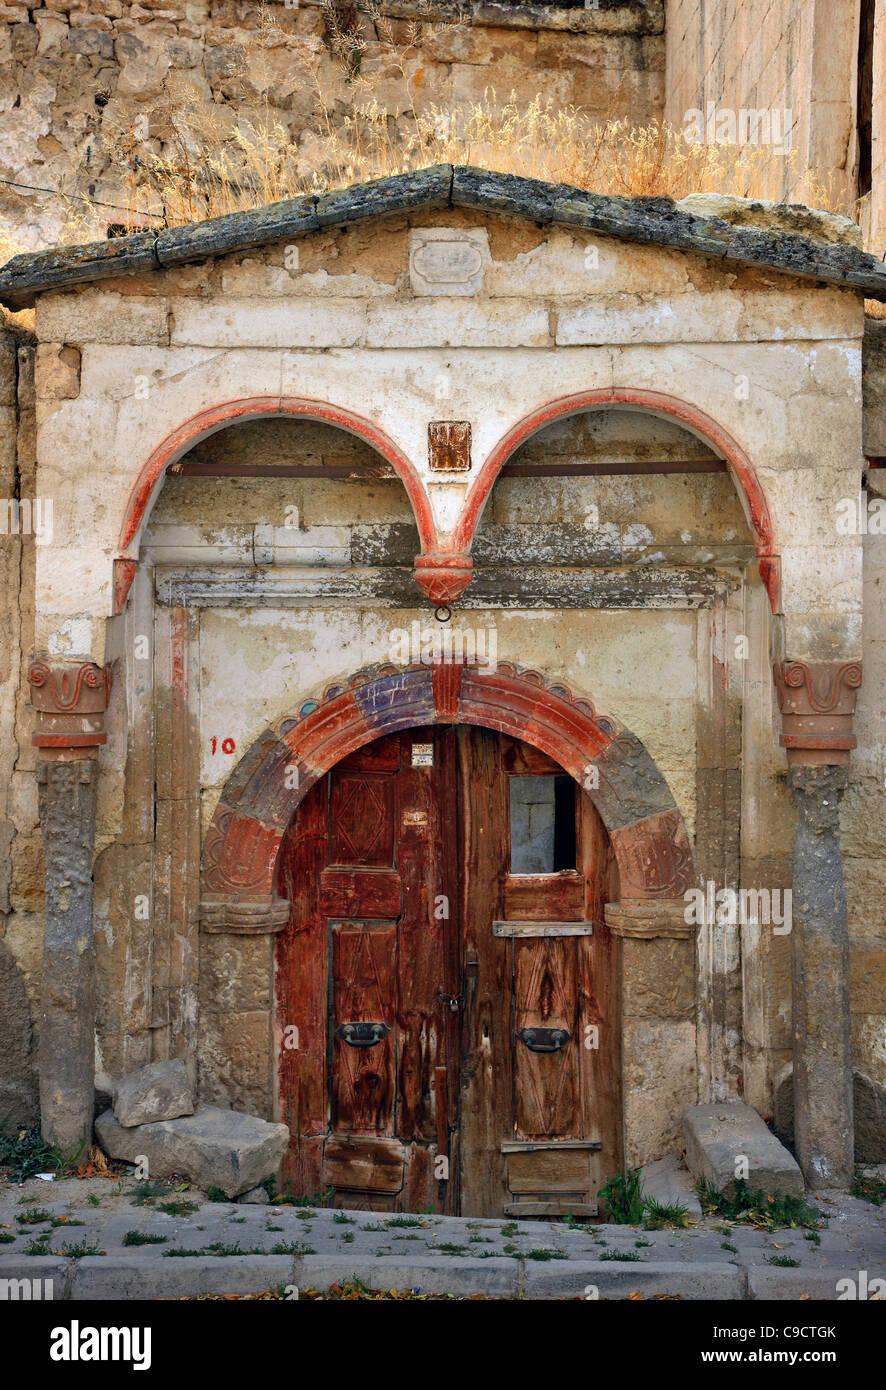 A beautiful traditional old door in Sinasos village (nowadays called 'Mustafapasa'), Nevsehir, Cappadocia, - Stock Image